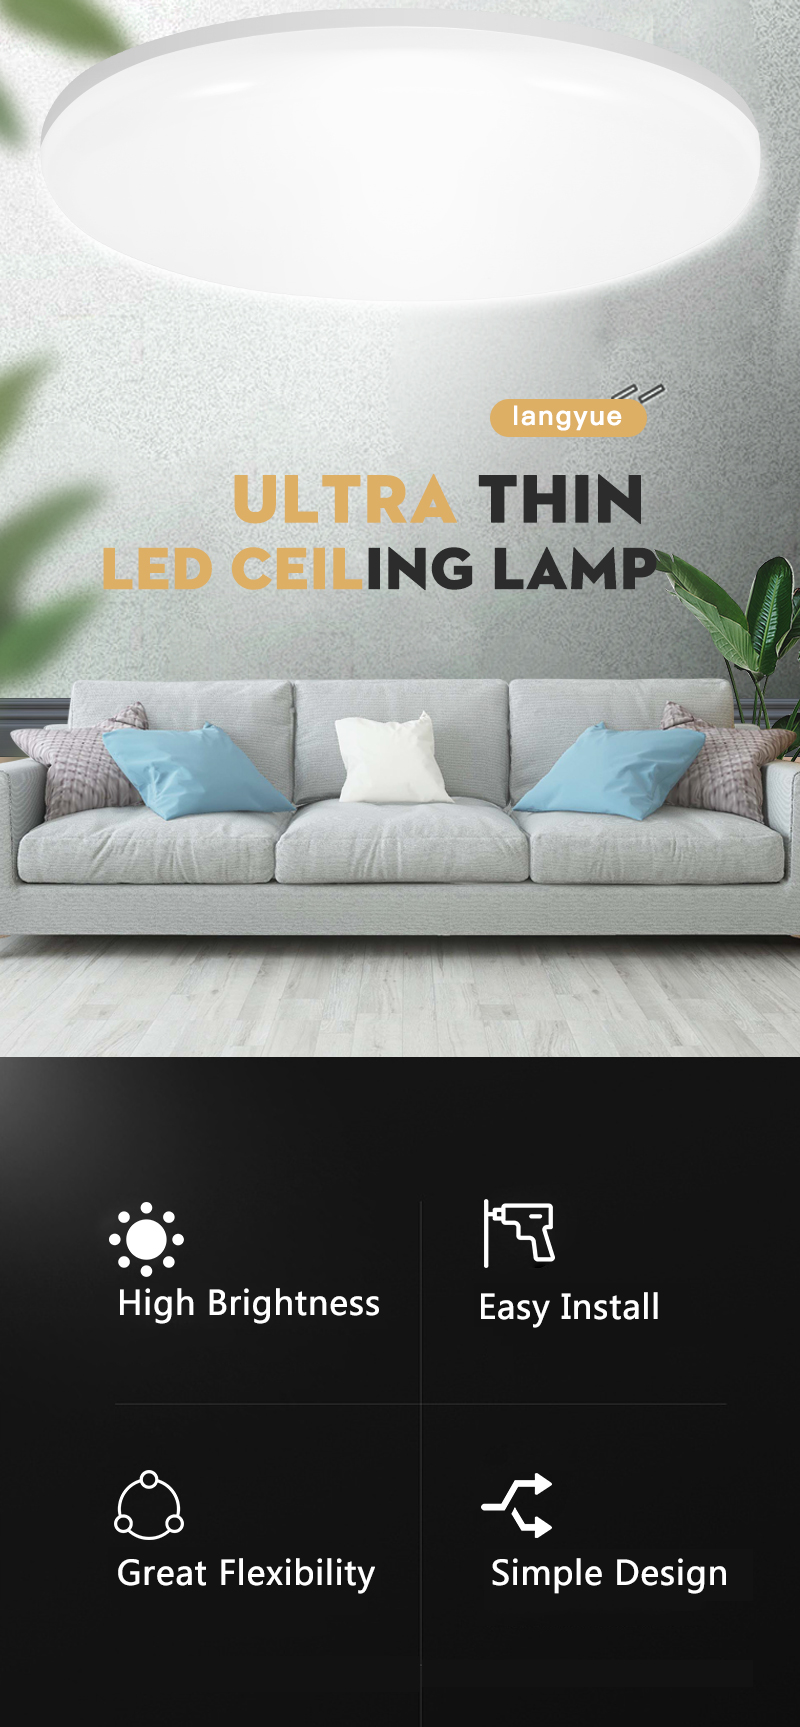 H9376b63eeb1d462b95f7be46ce0fa06b6 LED Ceiling Light 220V 12W 18W 20W 50W Modern Ceiling Lamp Lights 110V Surface Mount Lighting Fixture For Living Room Bathroom